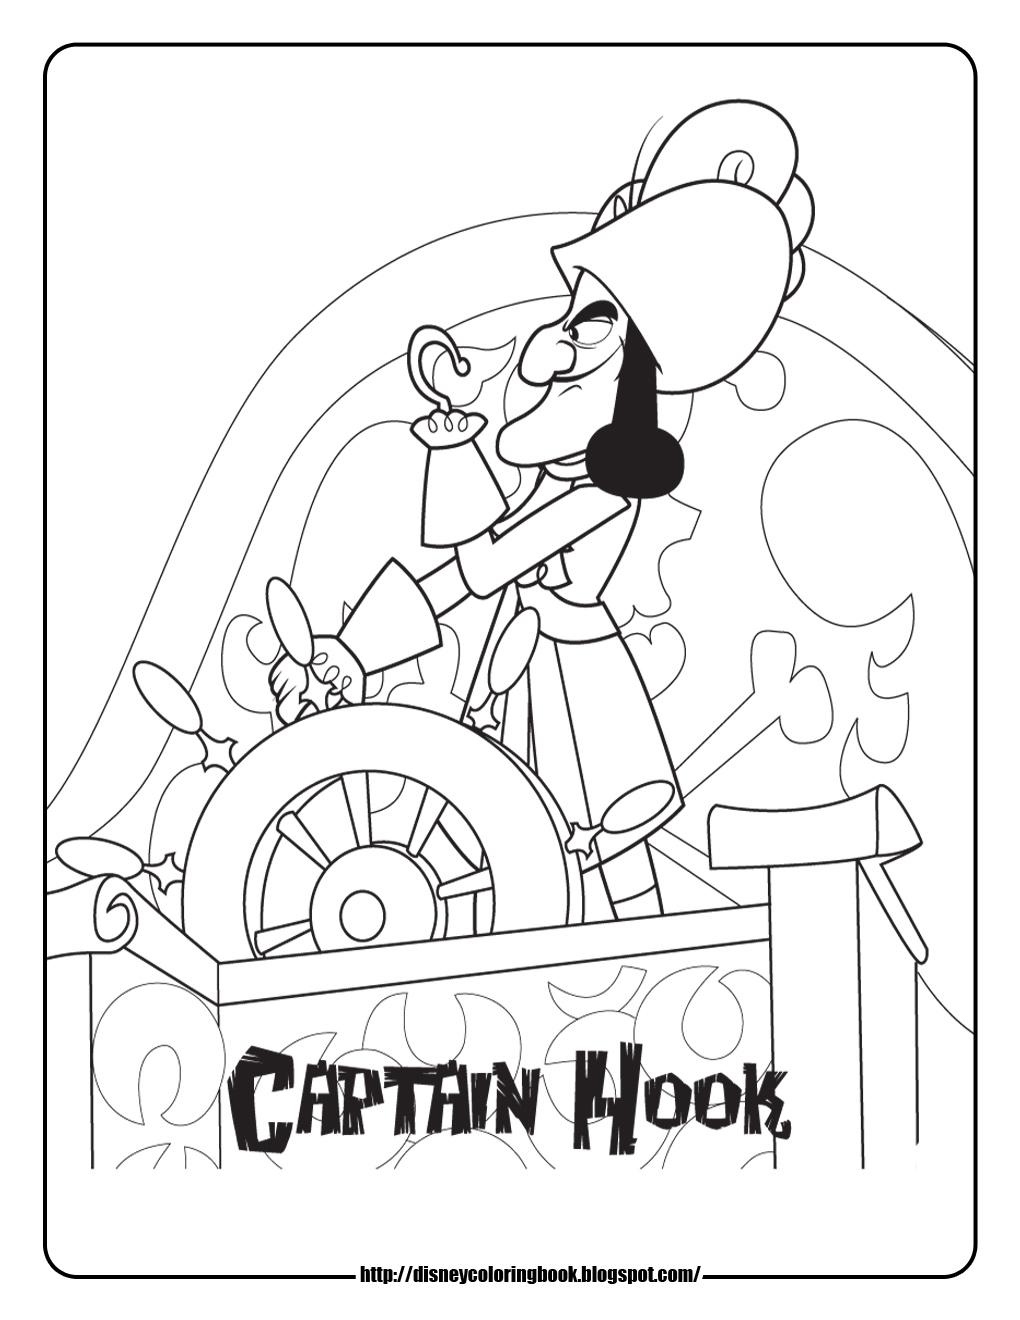 JNP Captain Hook.jpg